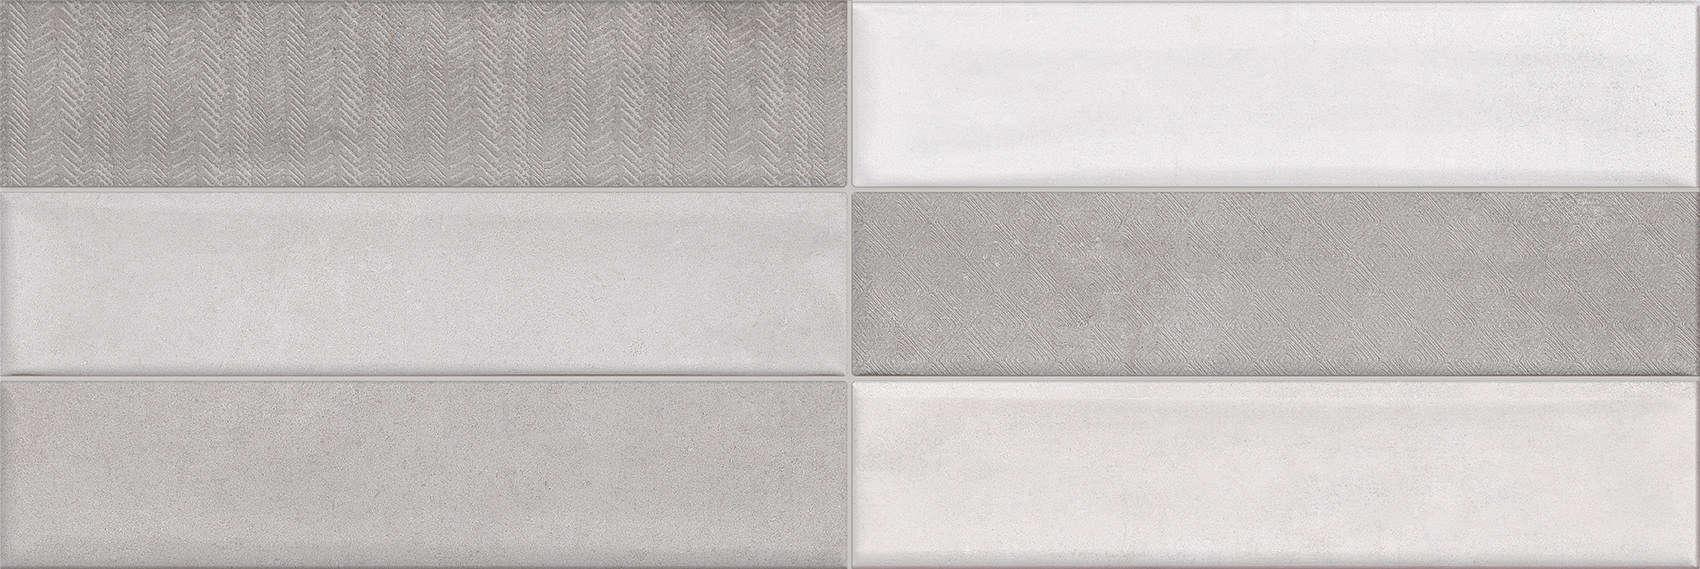 Faianță pentru baie Undefasa Noromadie Breton Brick Gris 250x750 mată gri / 7